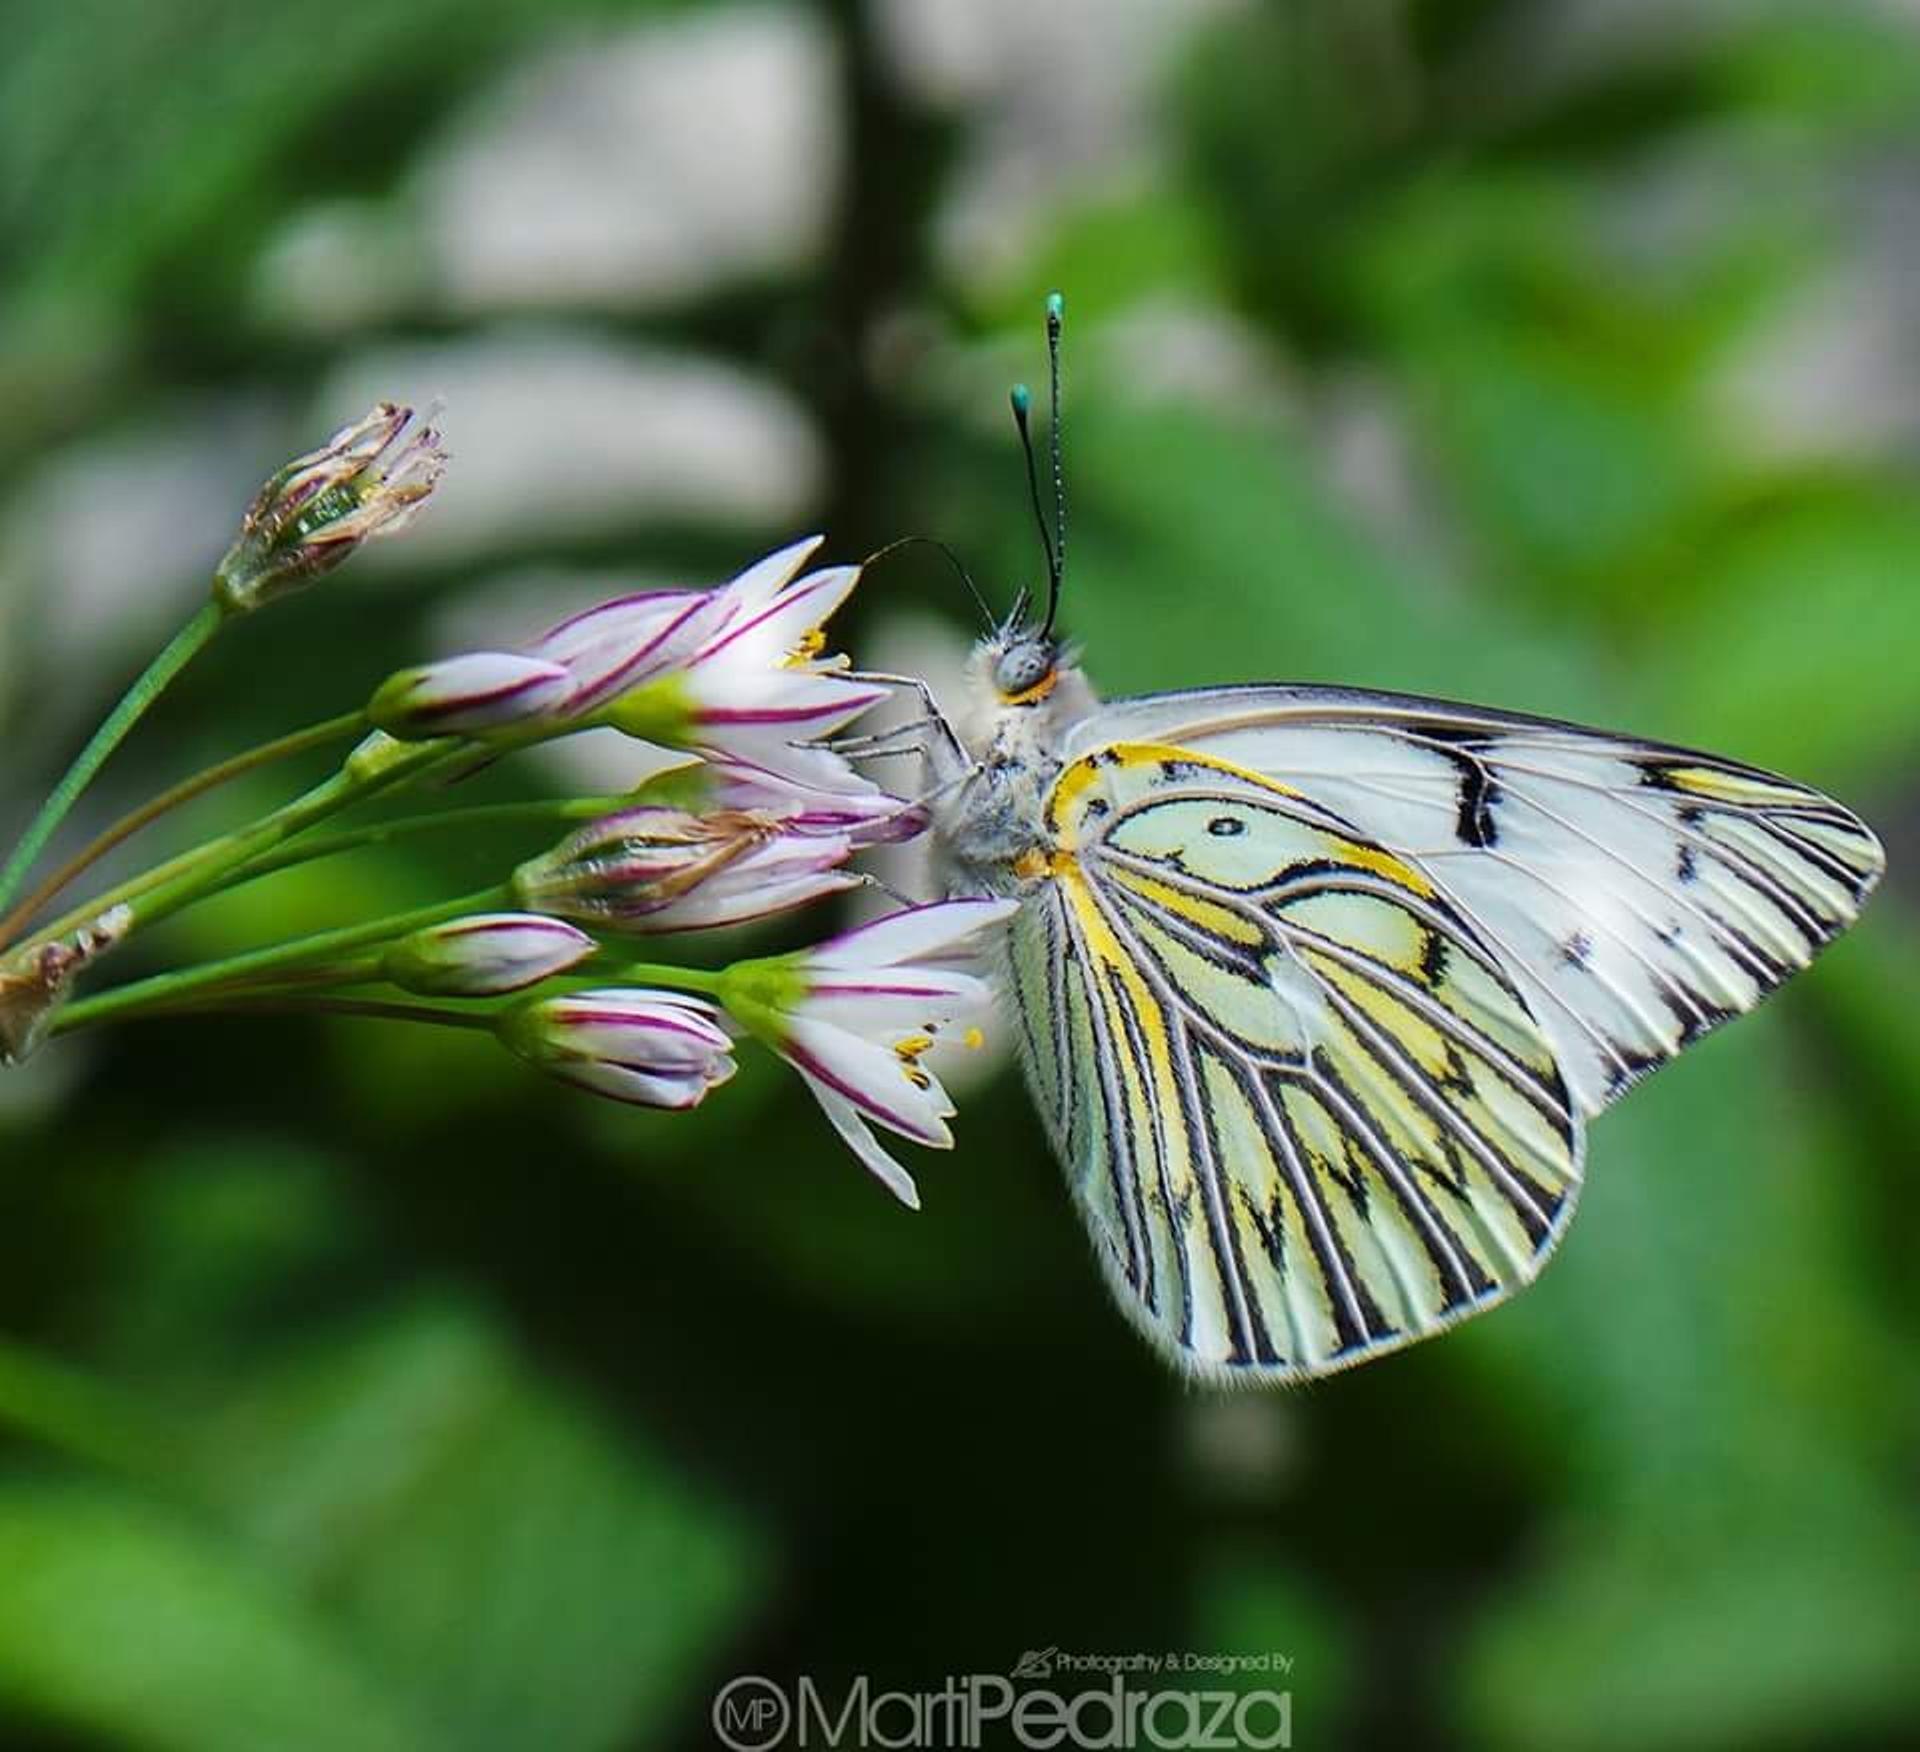 Butterfly by Marta Cristina Pedraza